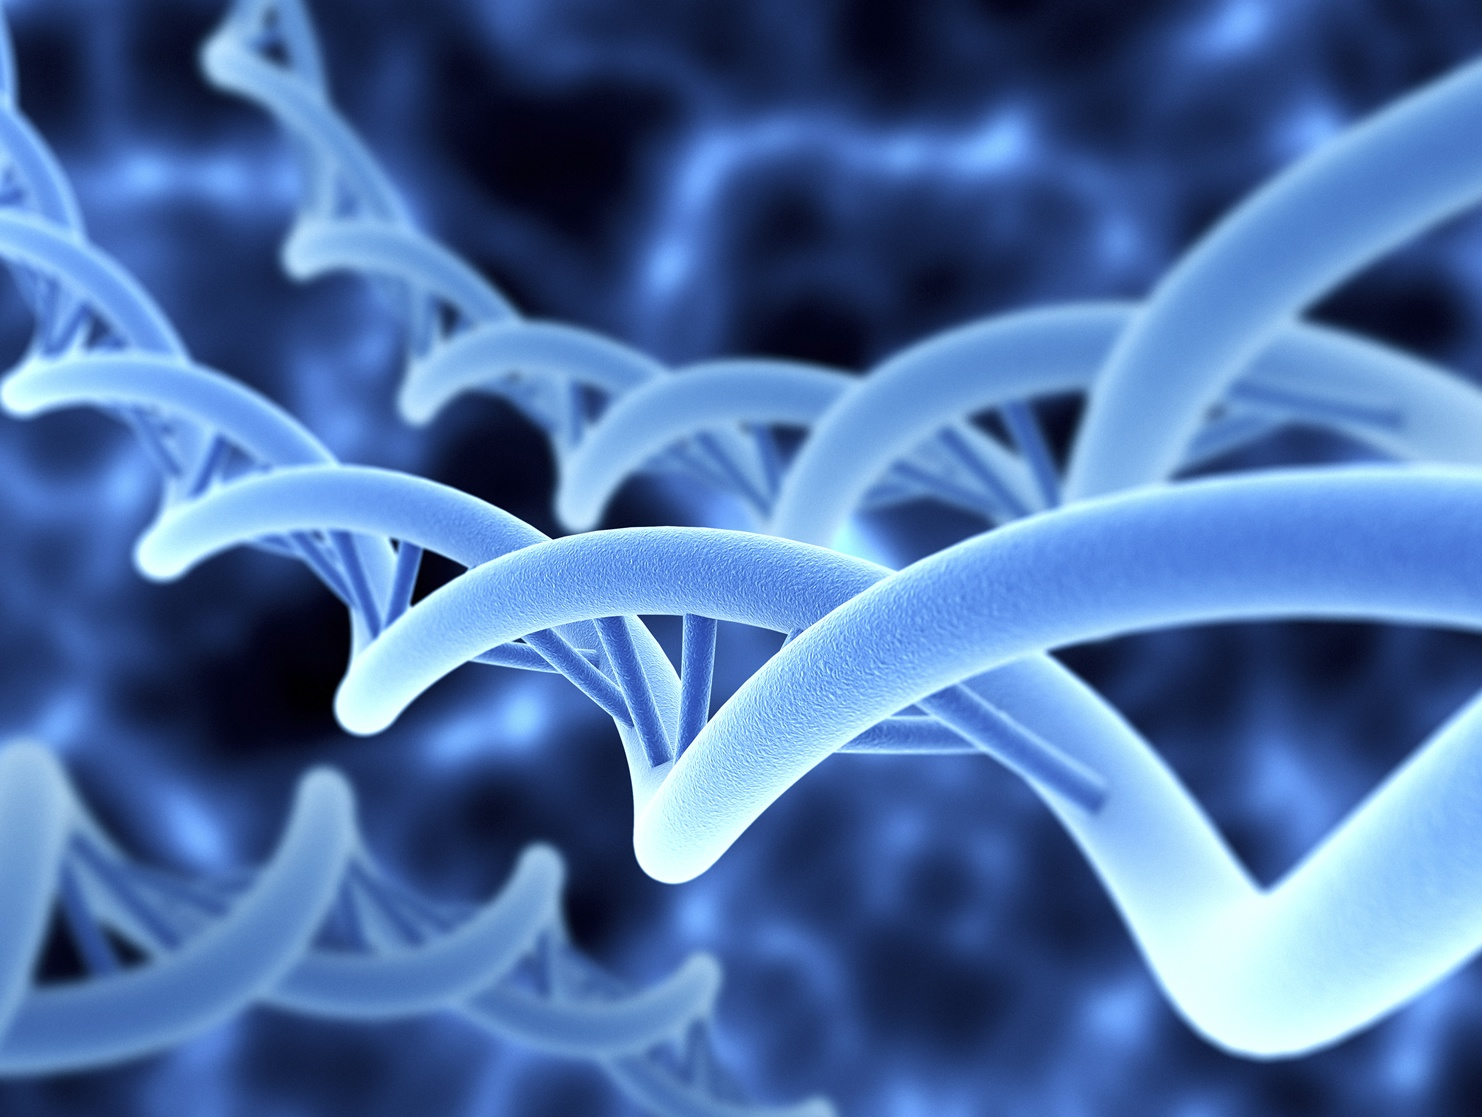 Chemical_structure_-_blue_background_-_Med.jpg